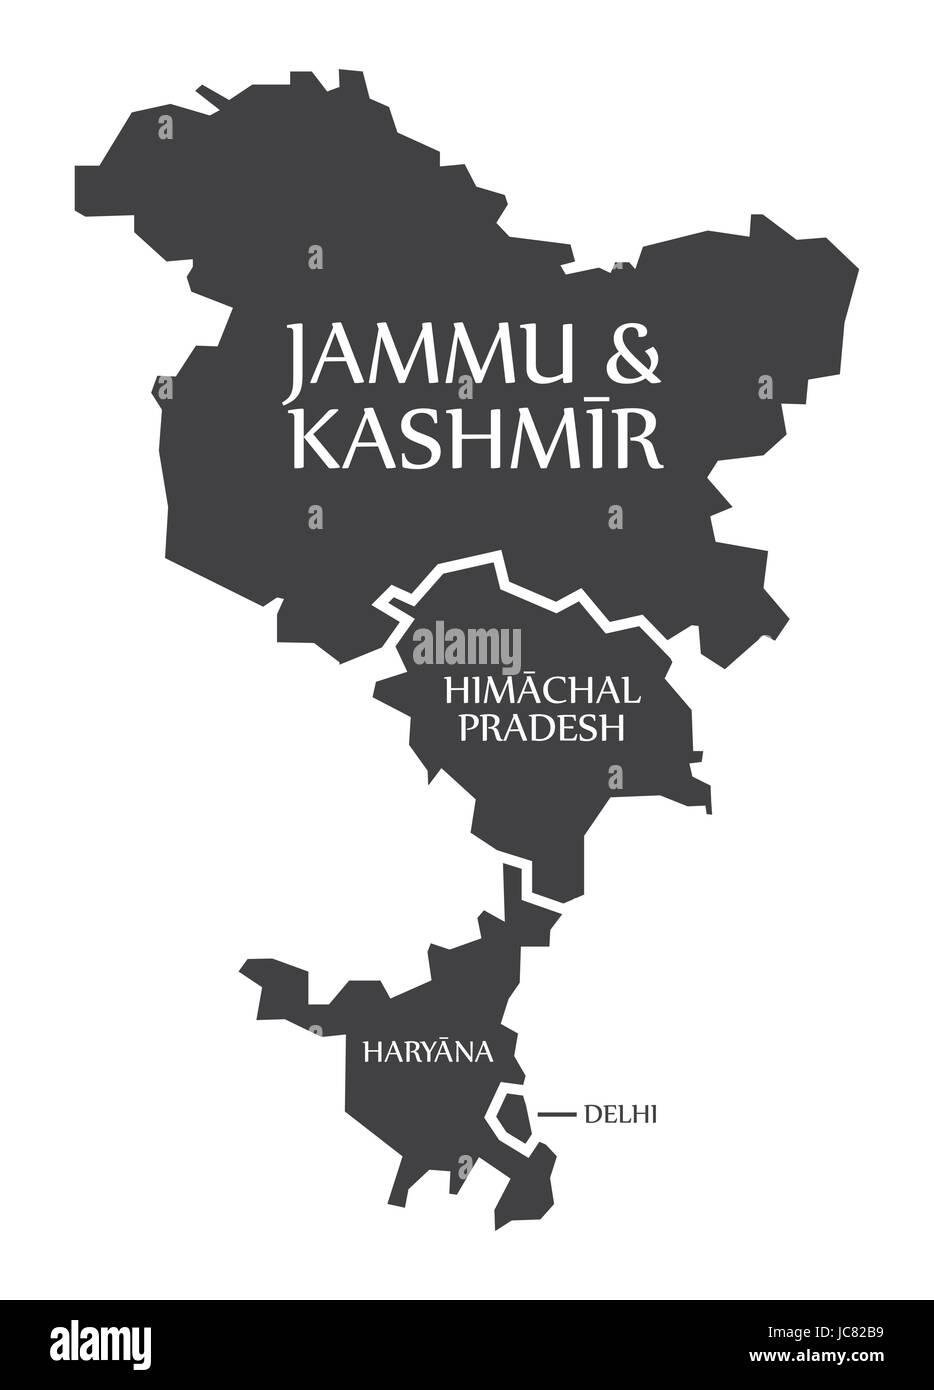 Jammu and Kashmir - Himachal Pradesh - Haryana - Delhi Map Illustration of Indian states - Stock Vector